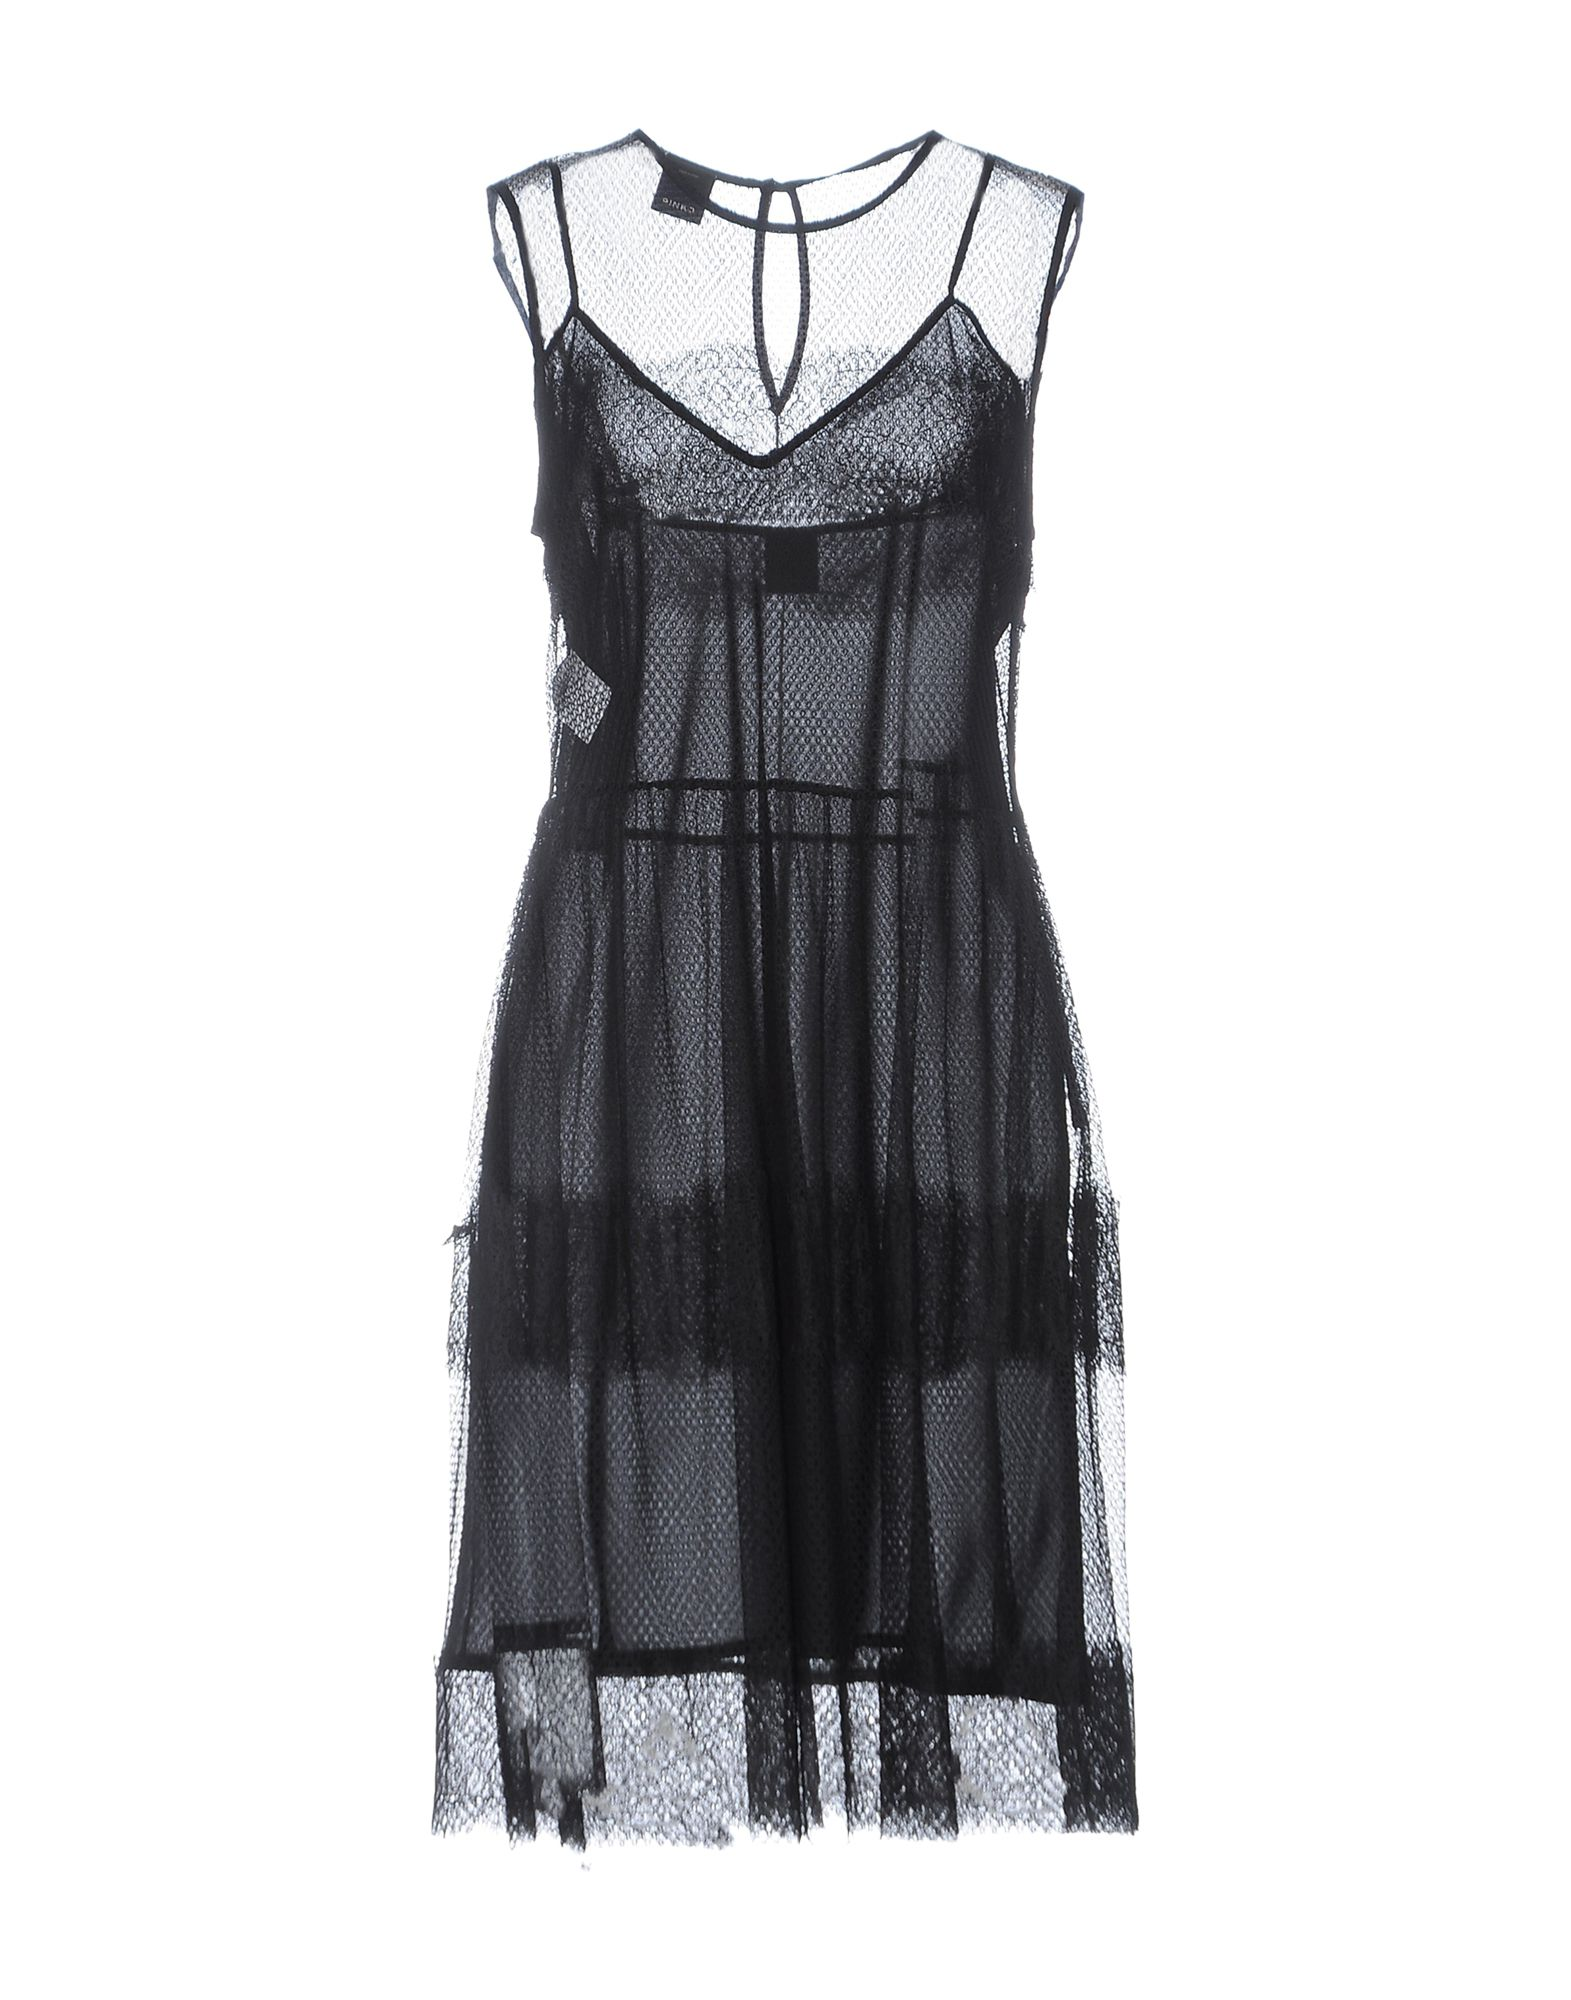 PINKO ΦΟΡΕΜΑΤΑ Φόρεμα μέχρι το γόνατο